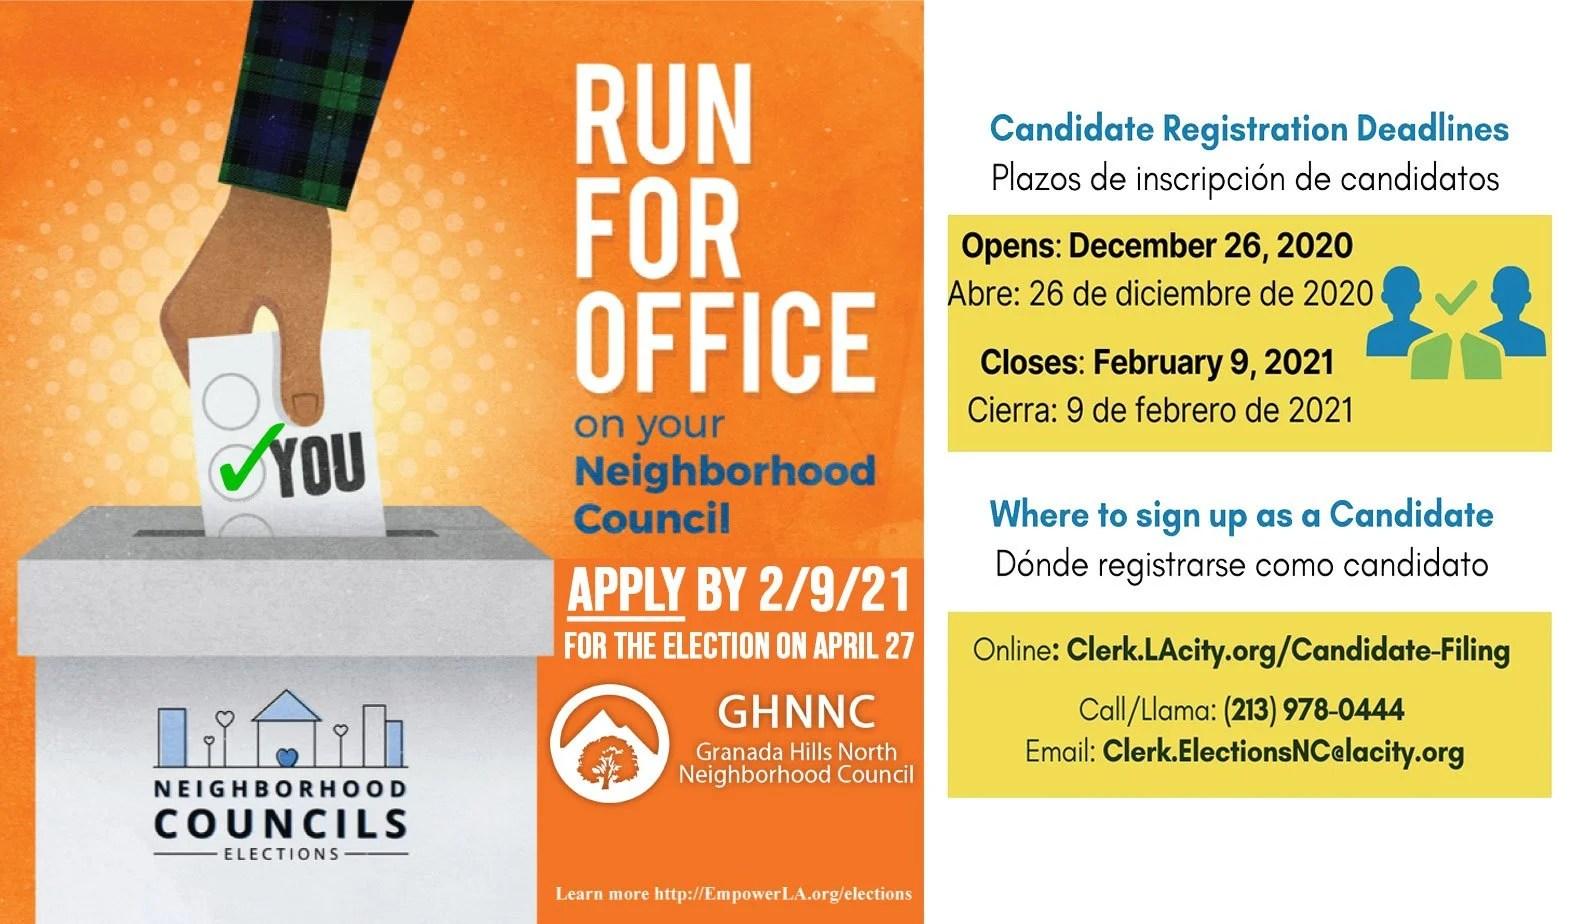 GHNNC-Election-Website-Flyer